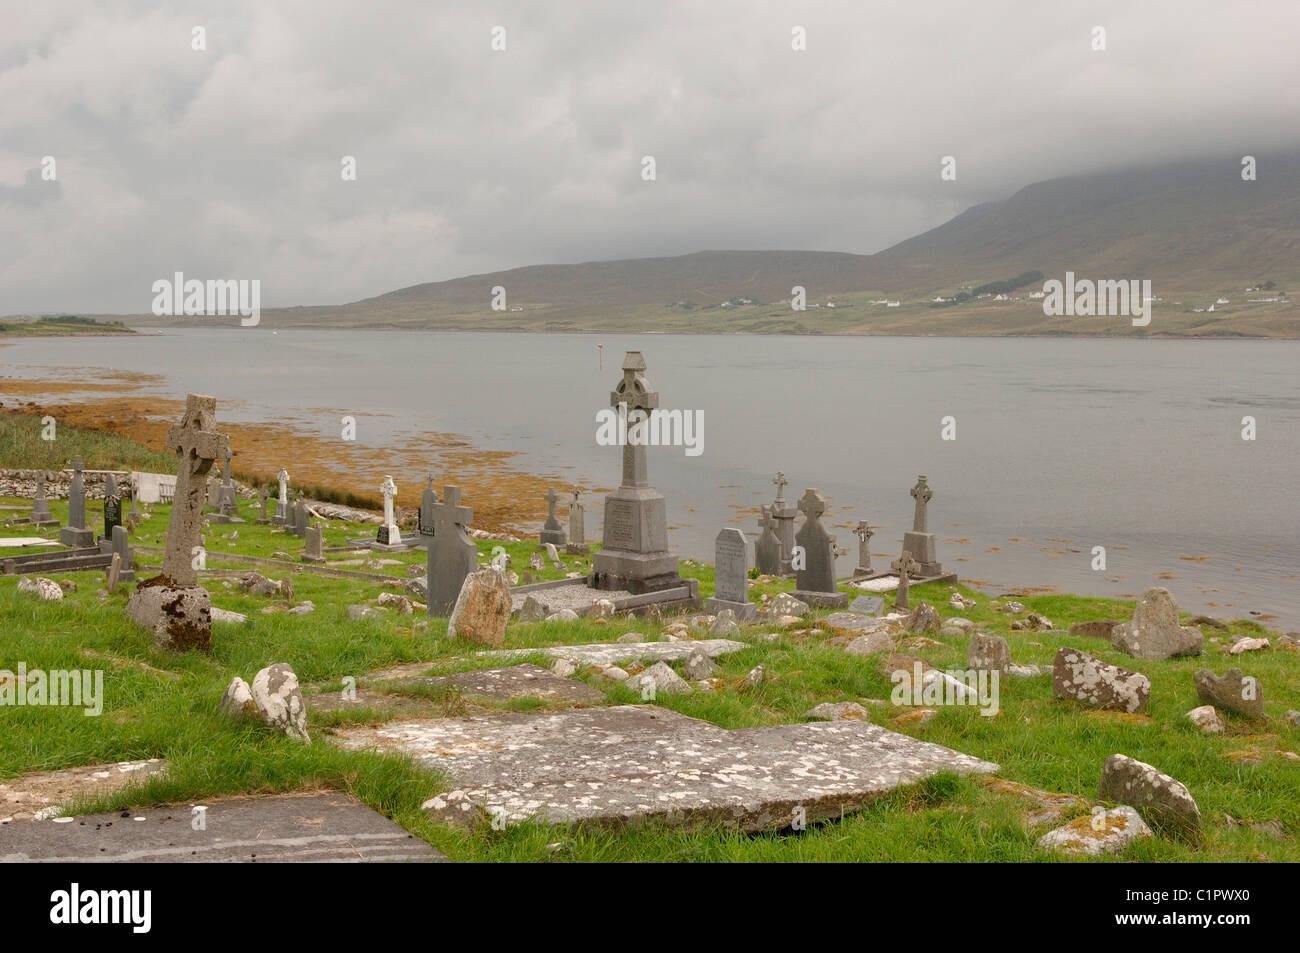 Republic of Ireland, County Mayo, Achill Island, Kildownet Graveyard overlooking Achill Sound - Stock Image